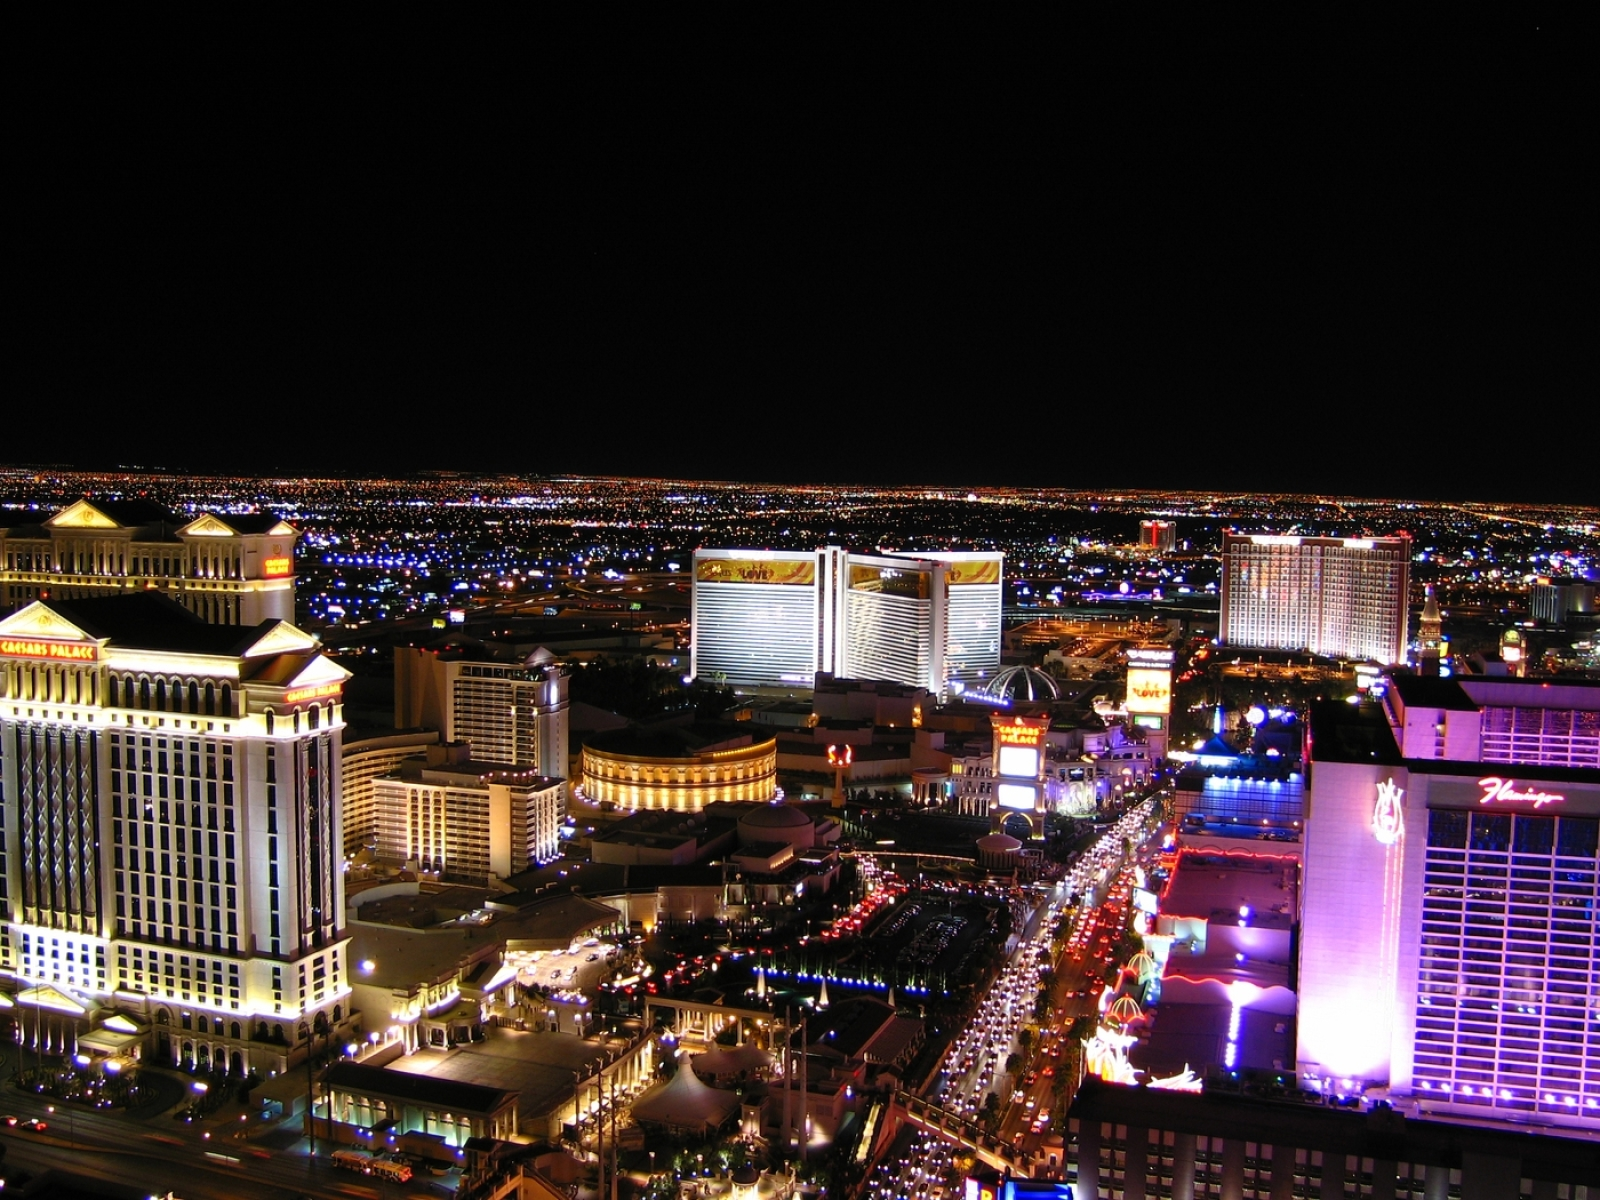 1600x1200 Las Vegas Night Hotels 1600x1200 Resolution Wallpaper